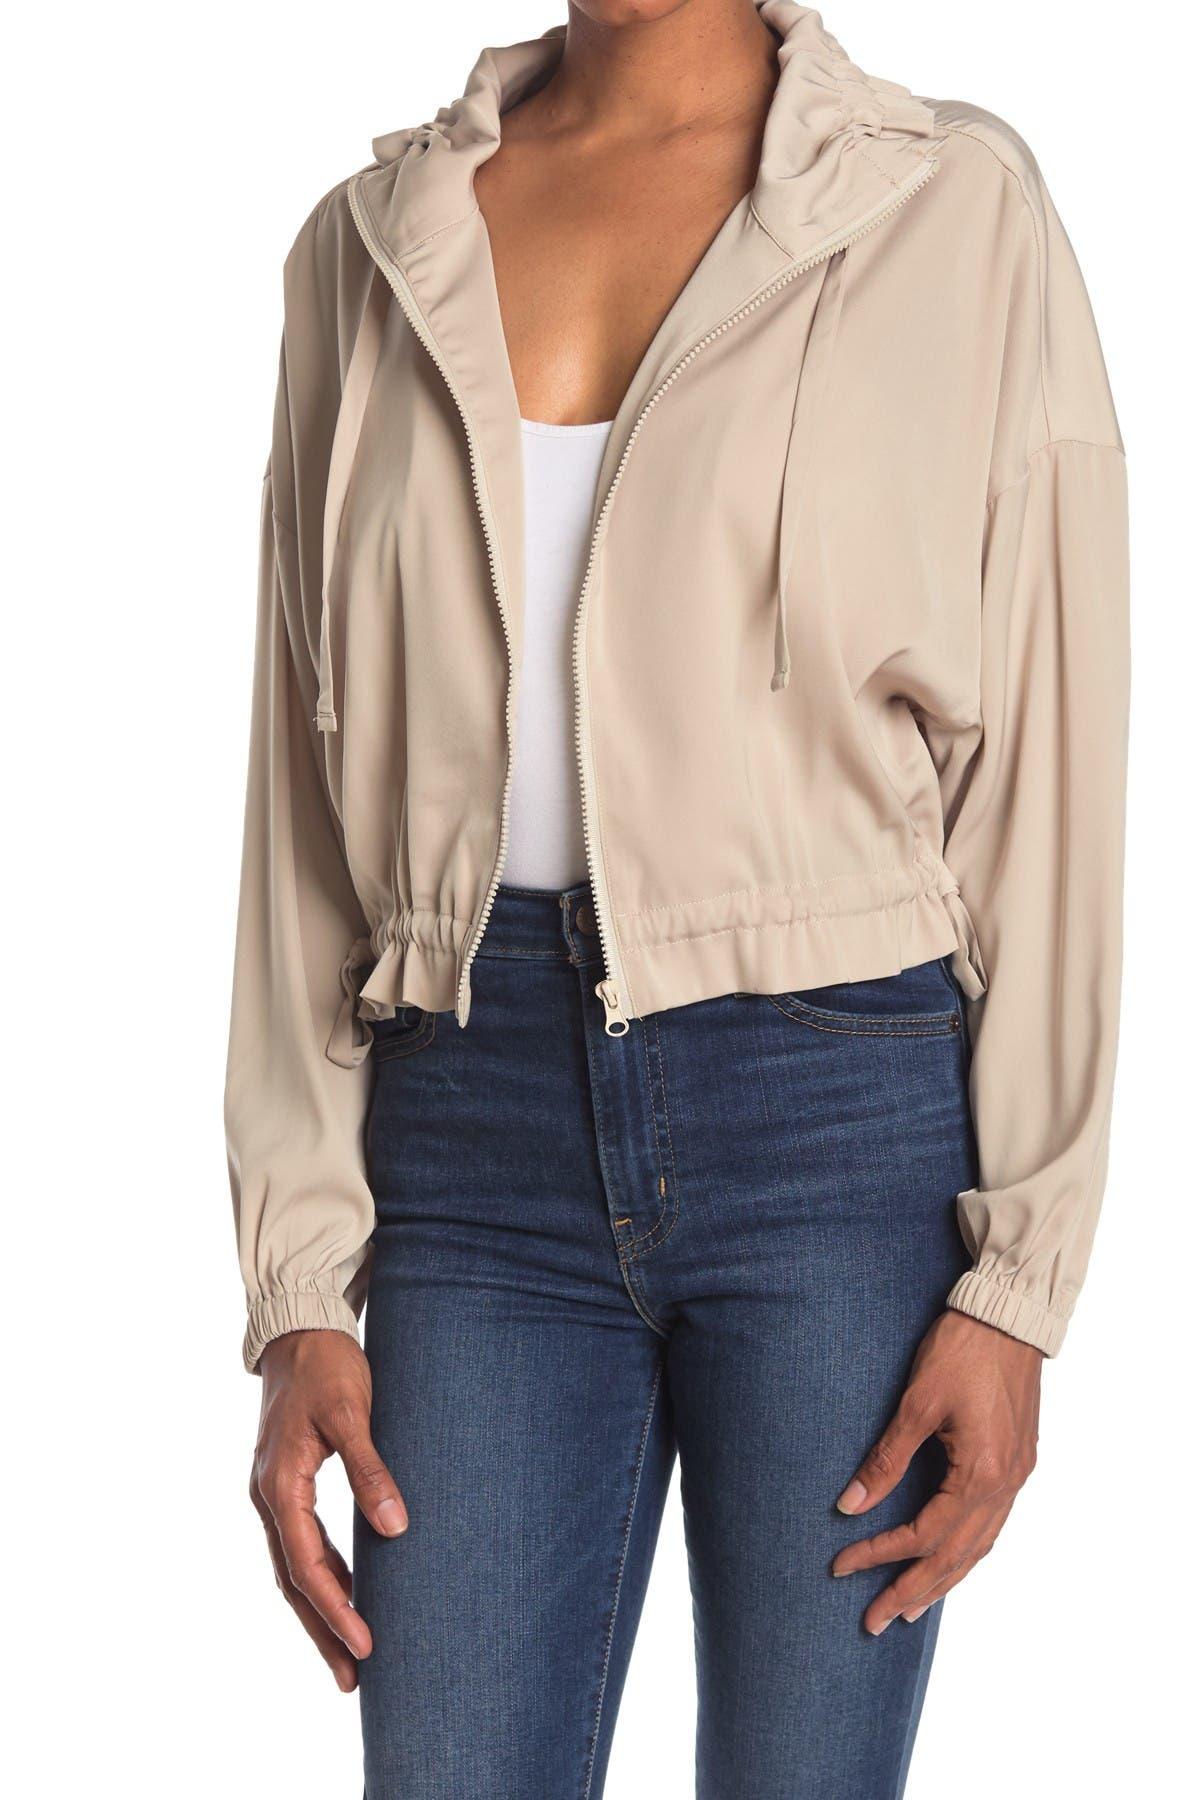 Image of Elodie Long Sleeve Drawstring Jacket